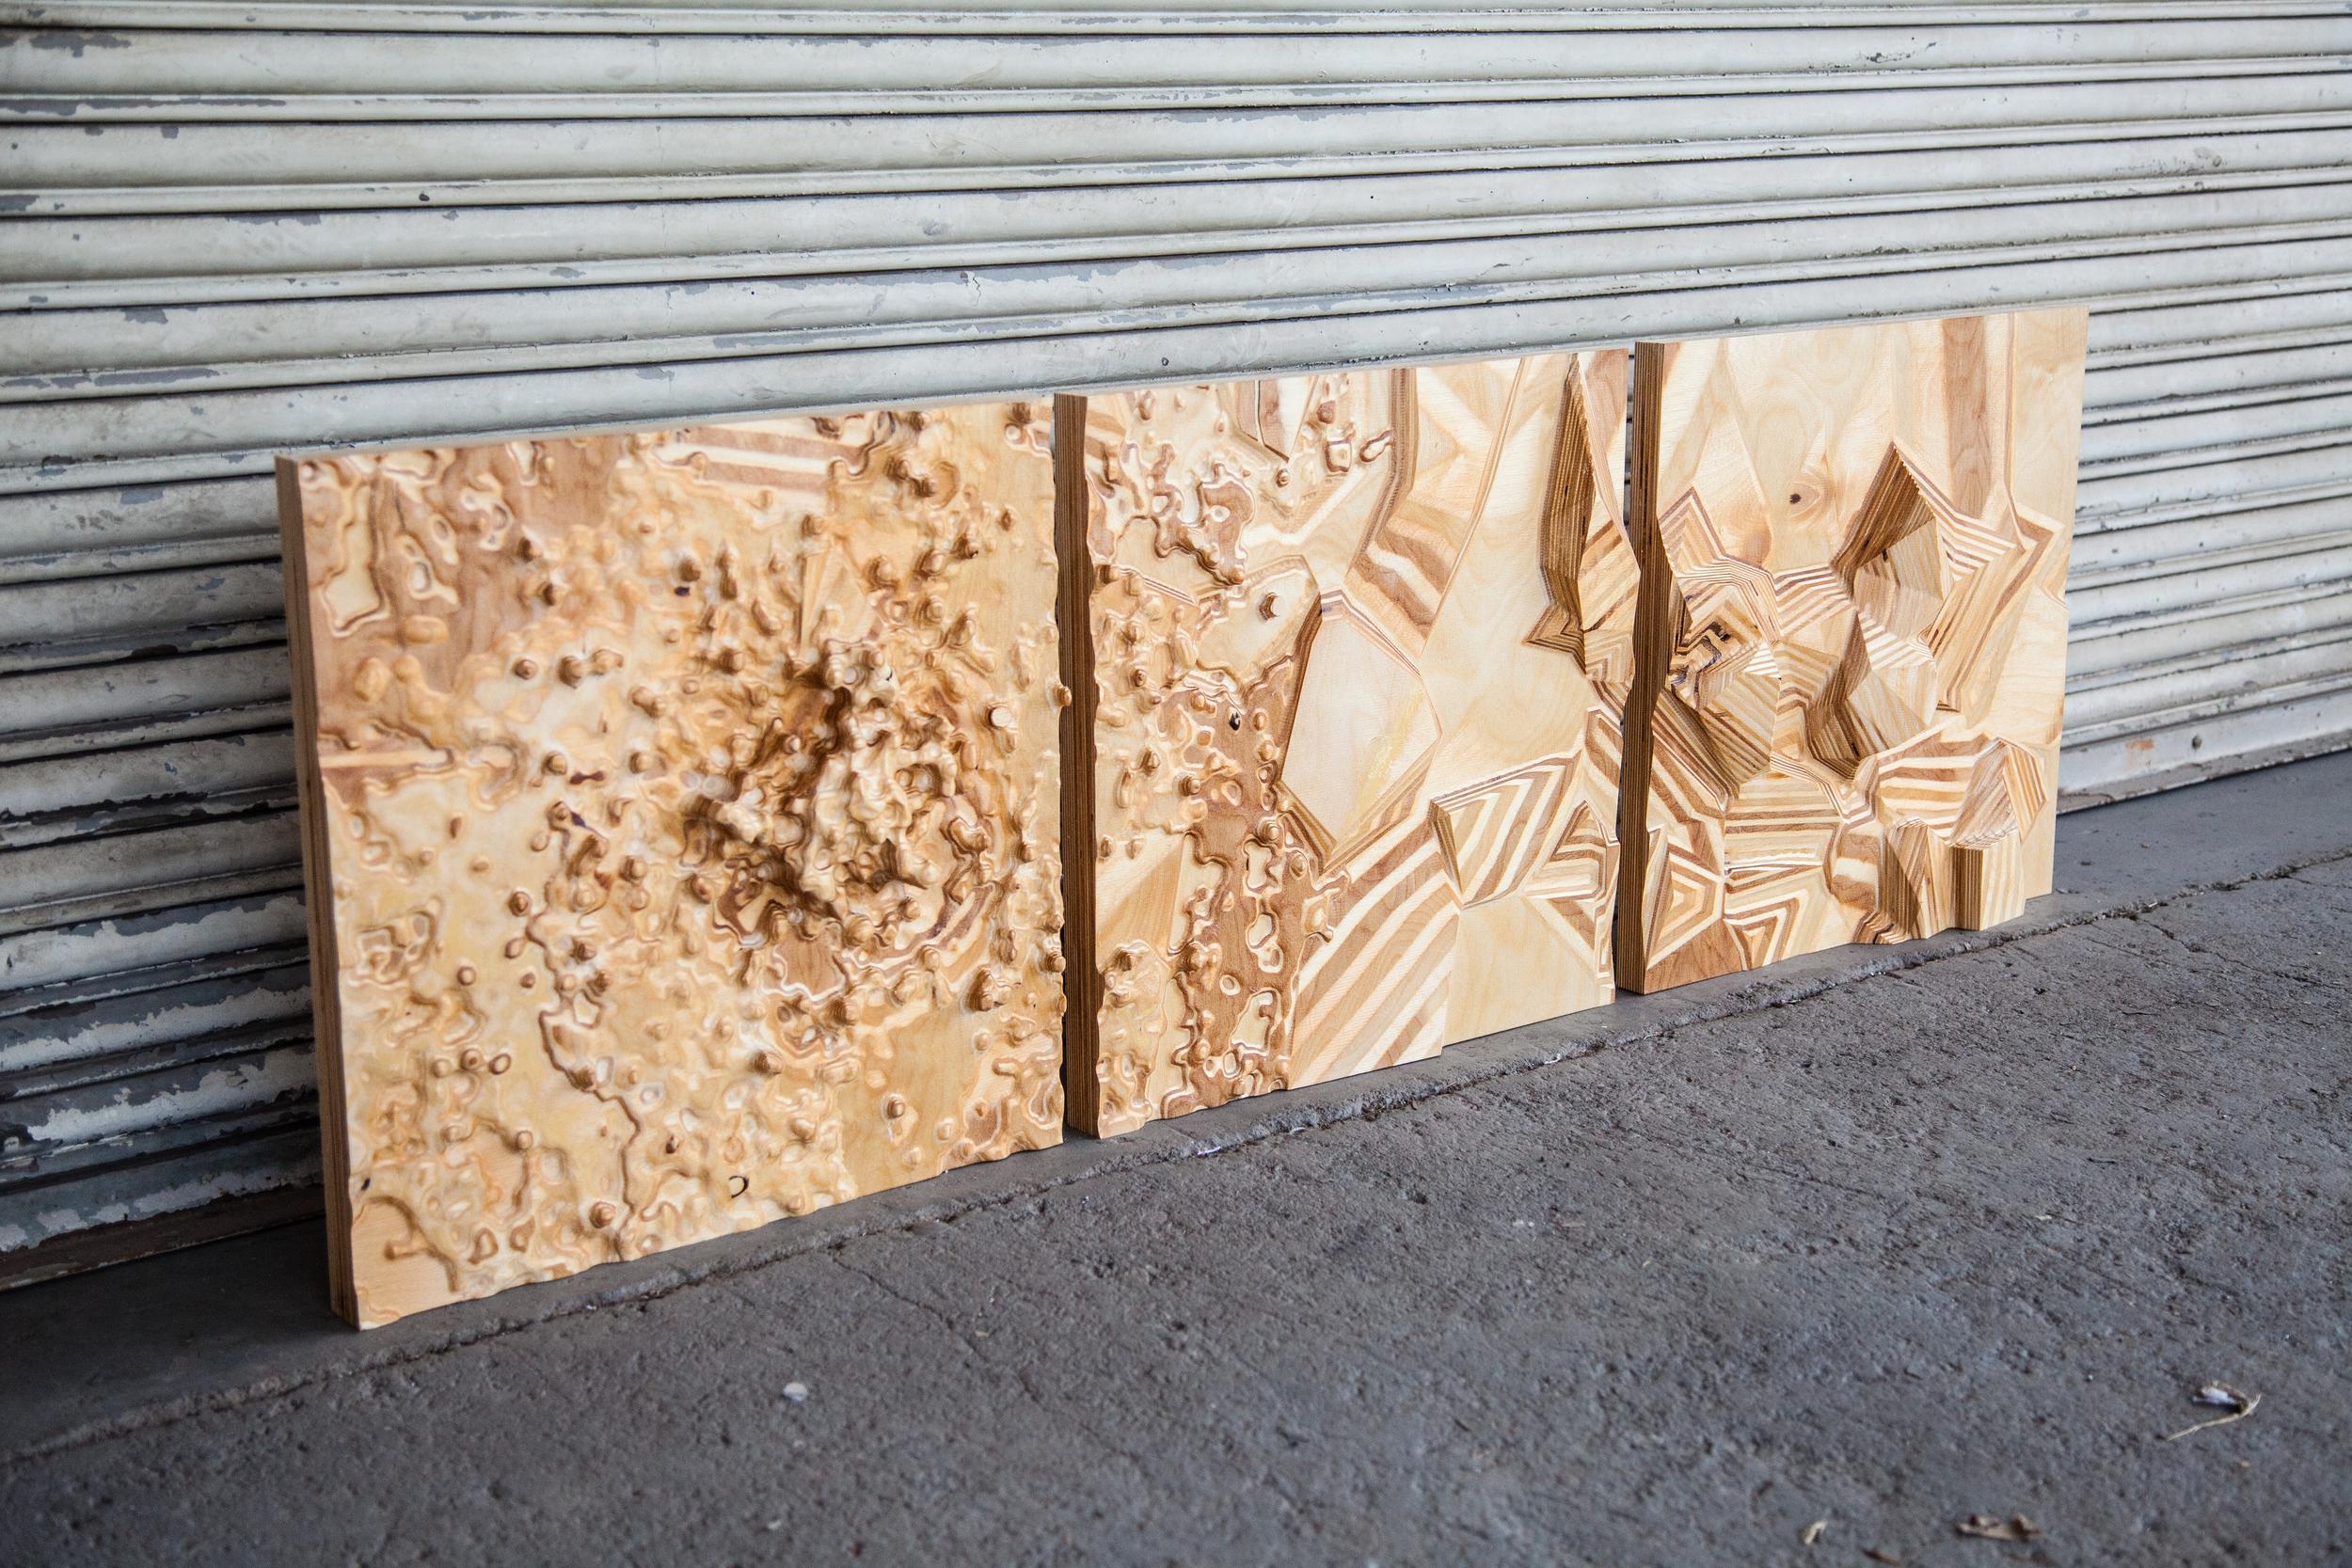 asteriskos-design-fabrication-baltic-birch-art-cnc-milling-wall-panels-simulation.jpg